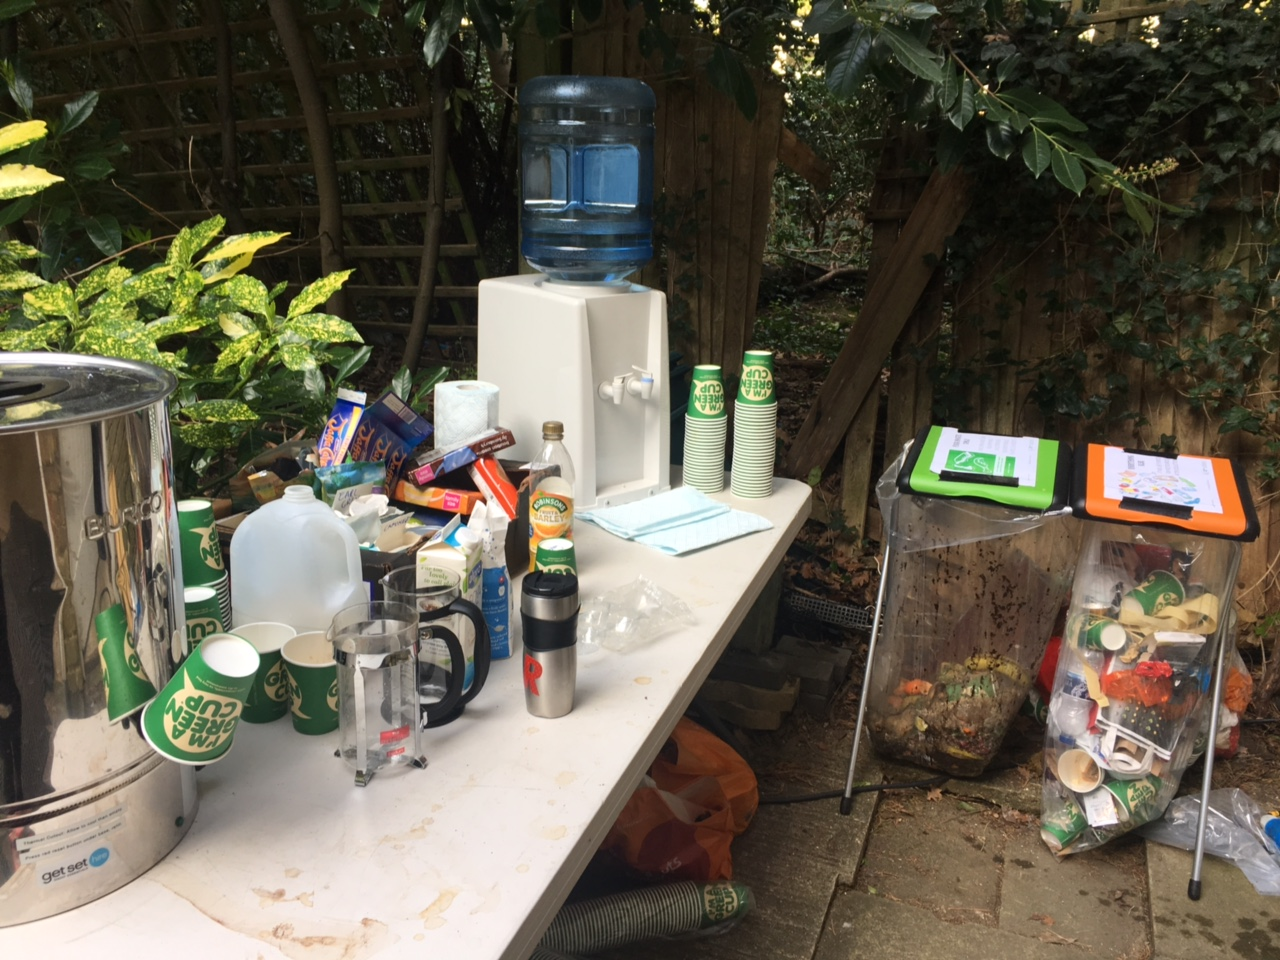 My tea table set up